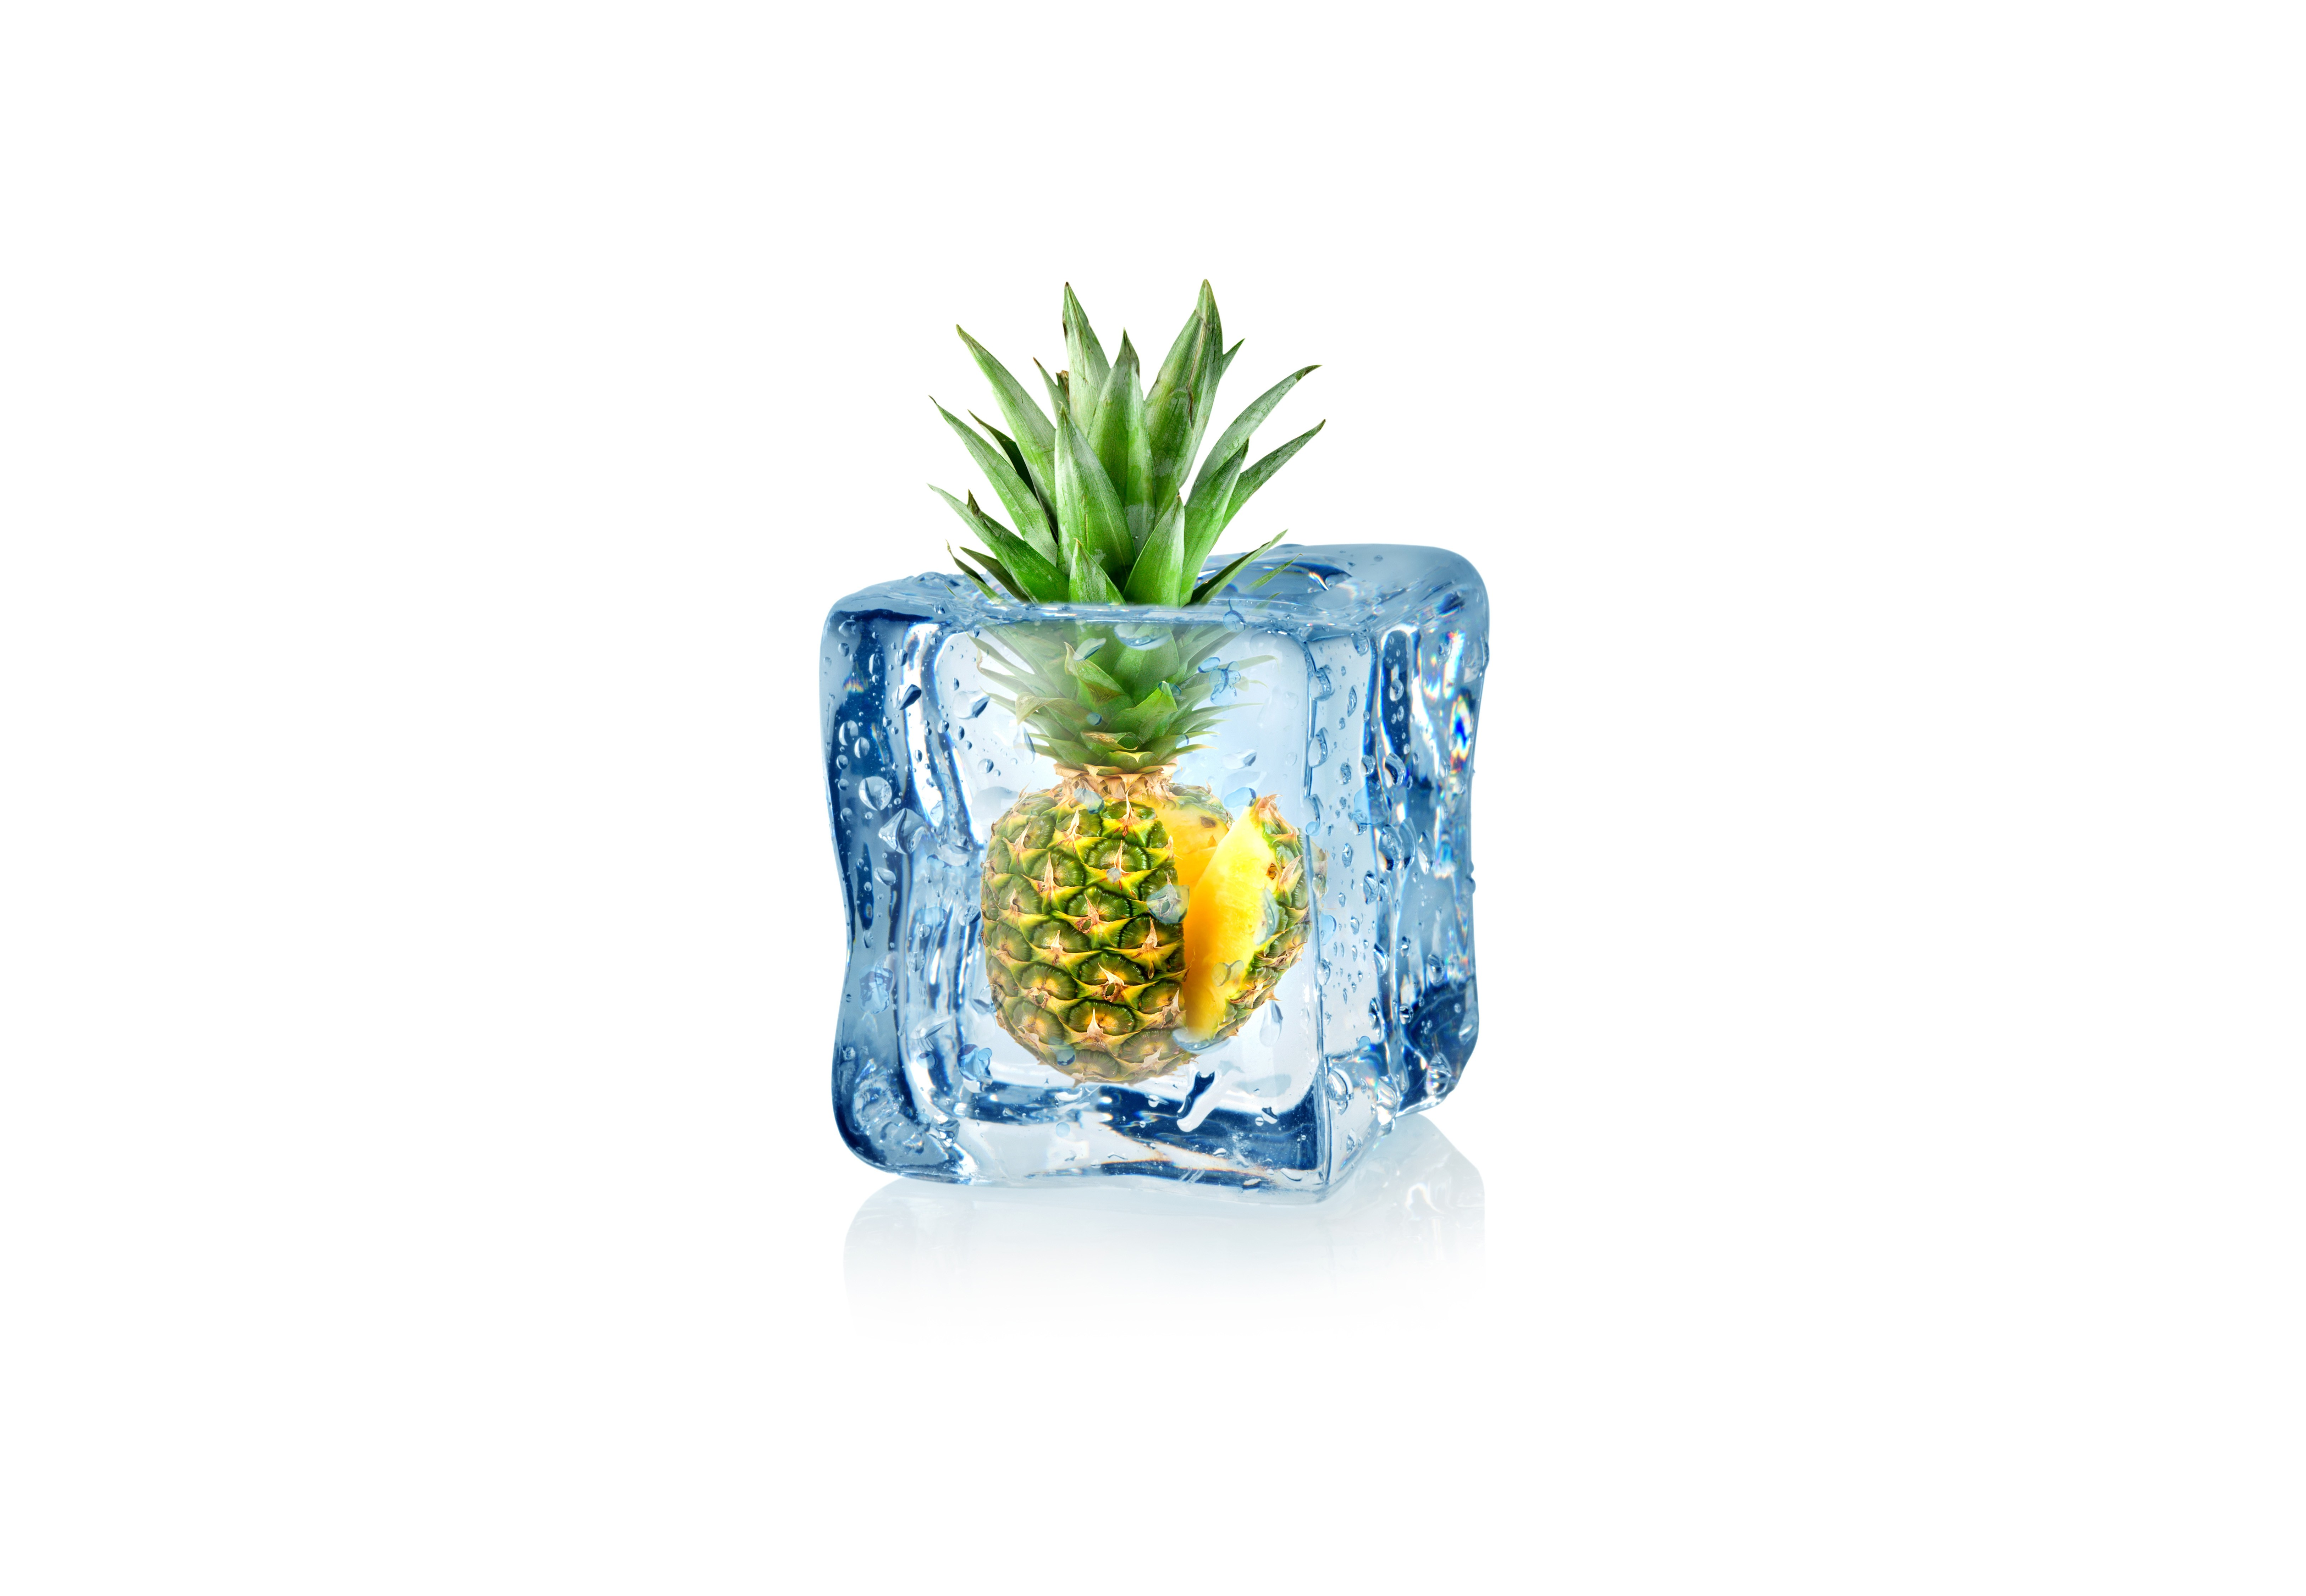 Best Wallpaper Mac Pineapple - pineapple-6500x4500-fruit-ice-5k-15926  Gallery_23387.jpg